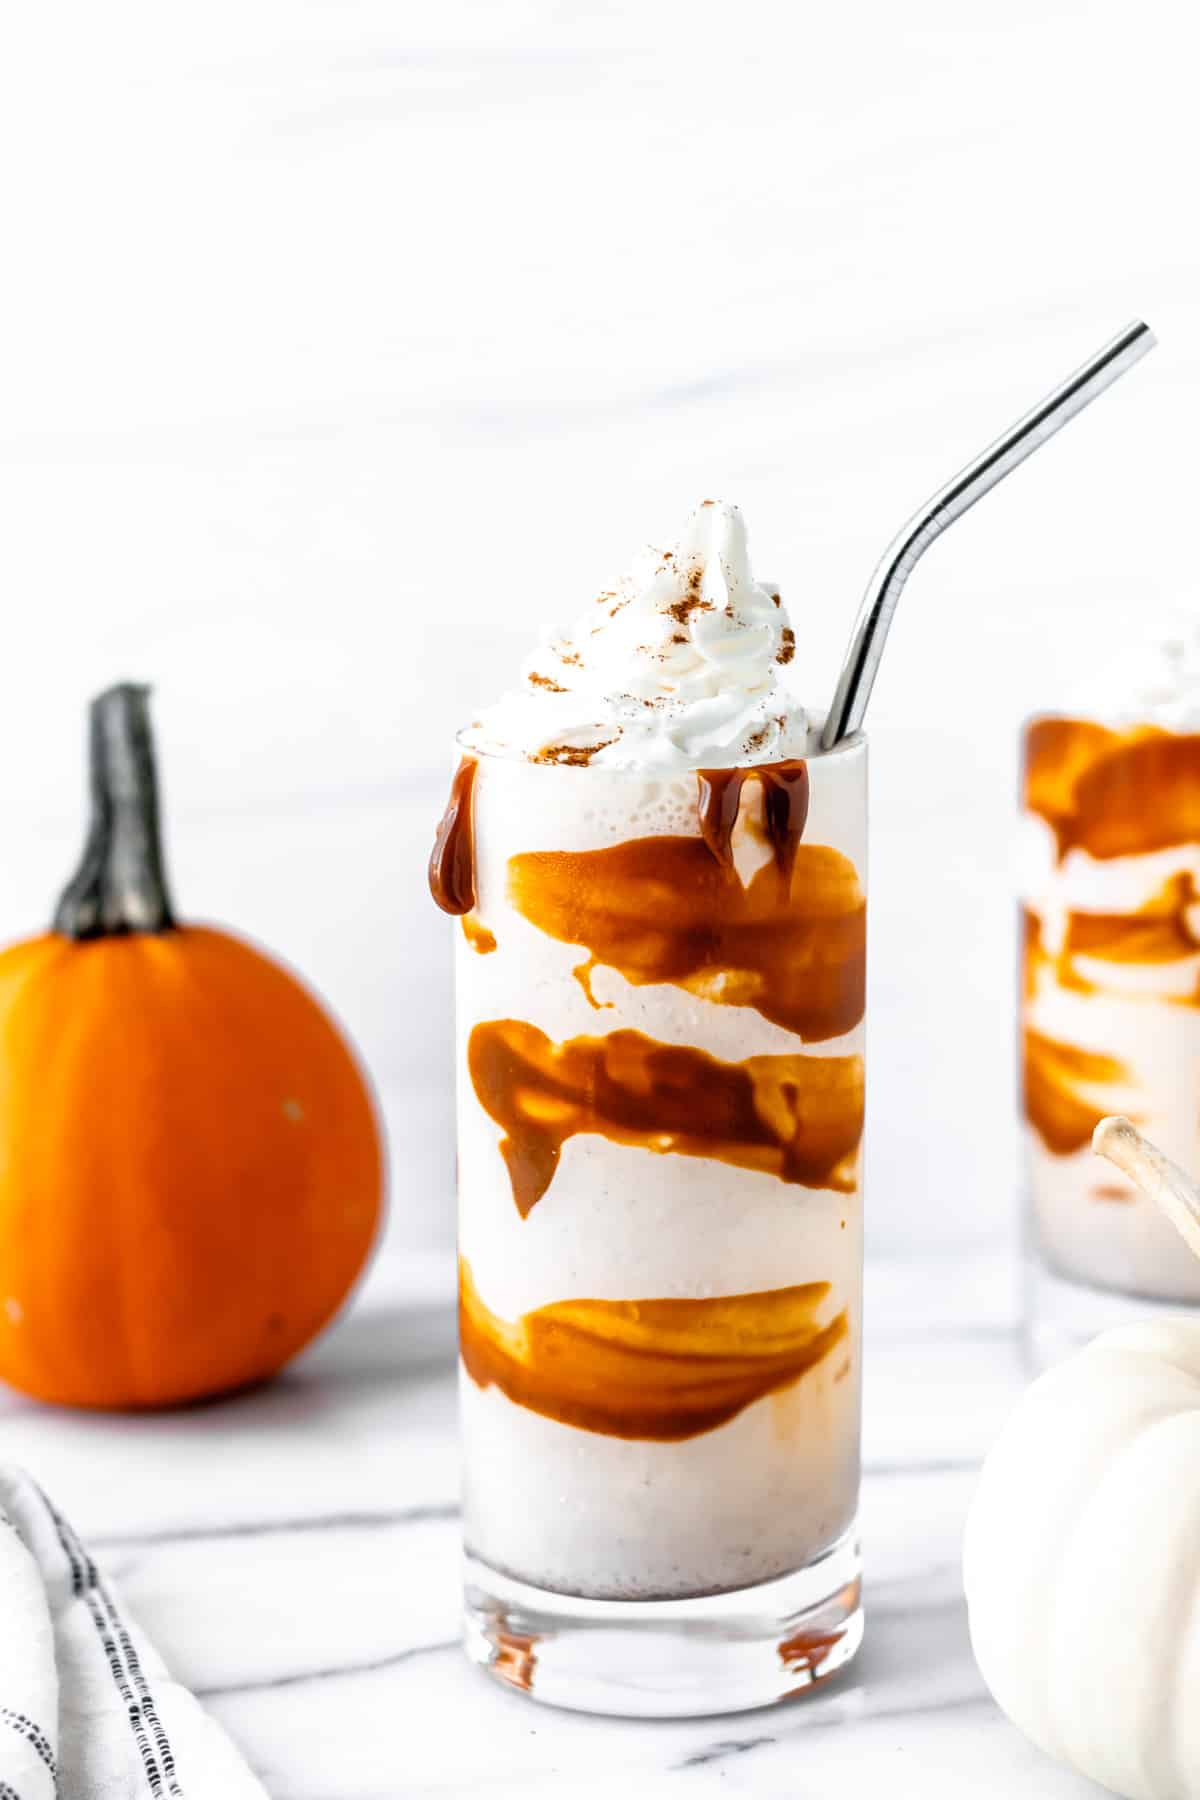 Pumpkin Spice Boozy Milkshake in a tall glass with a straw and pumpkins around it.